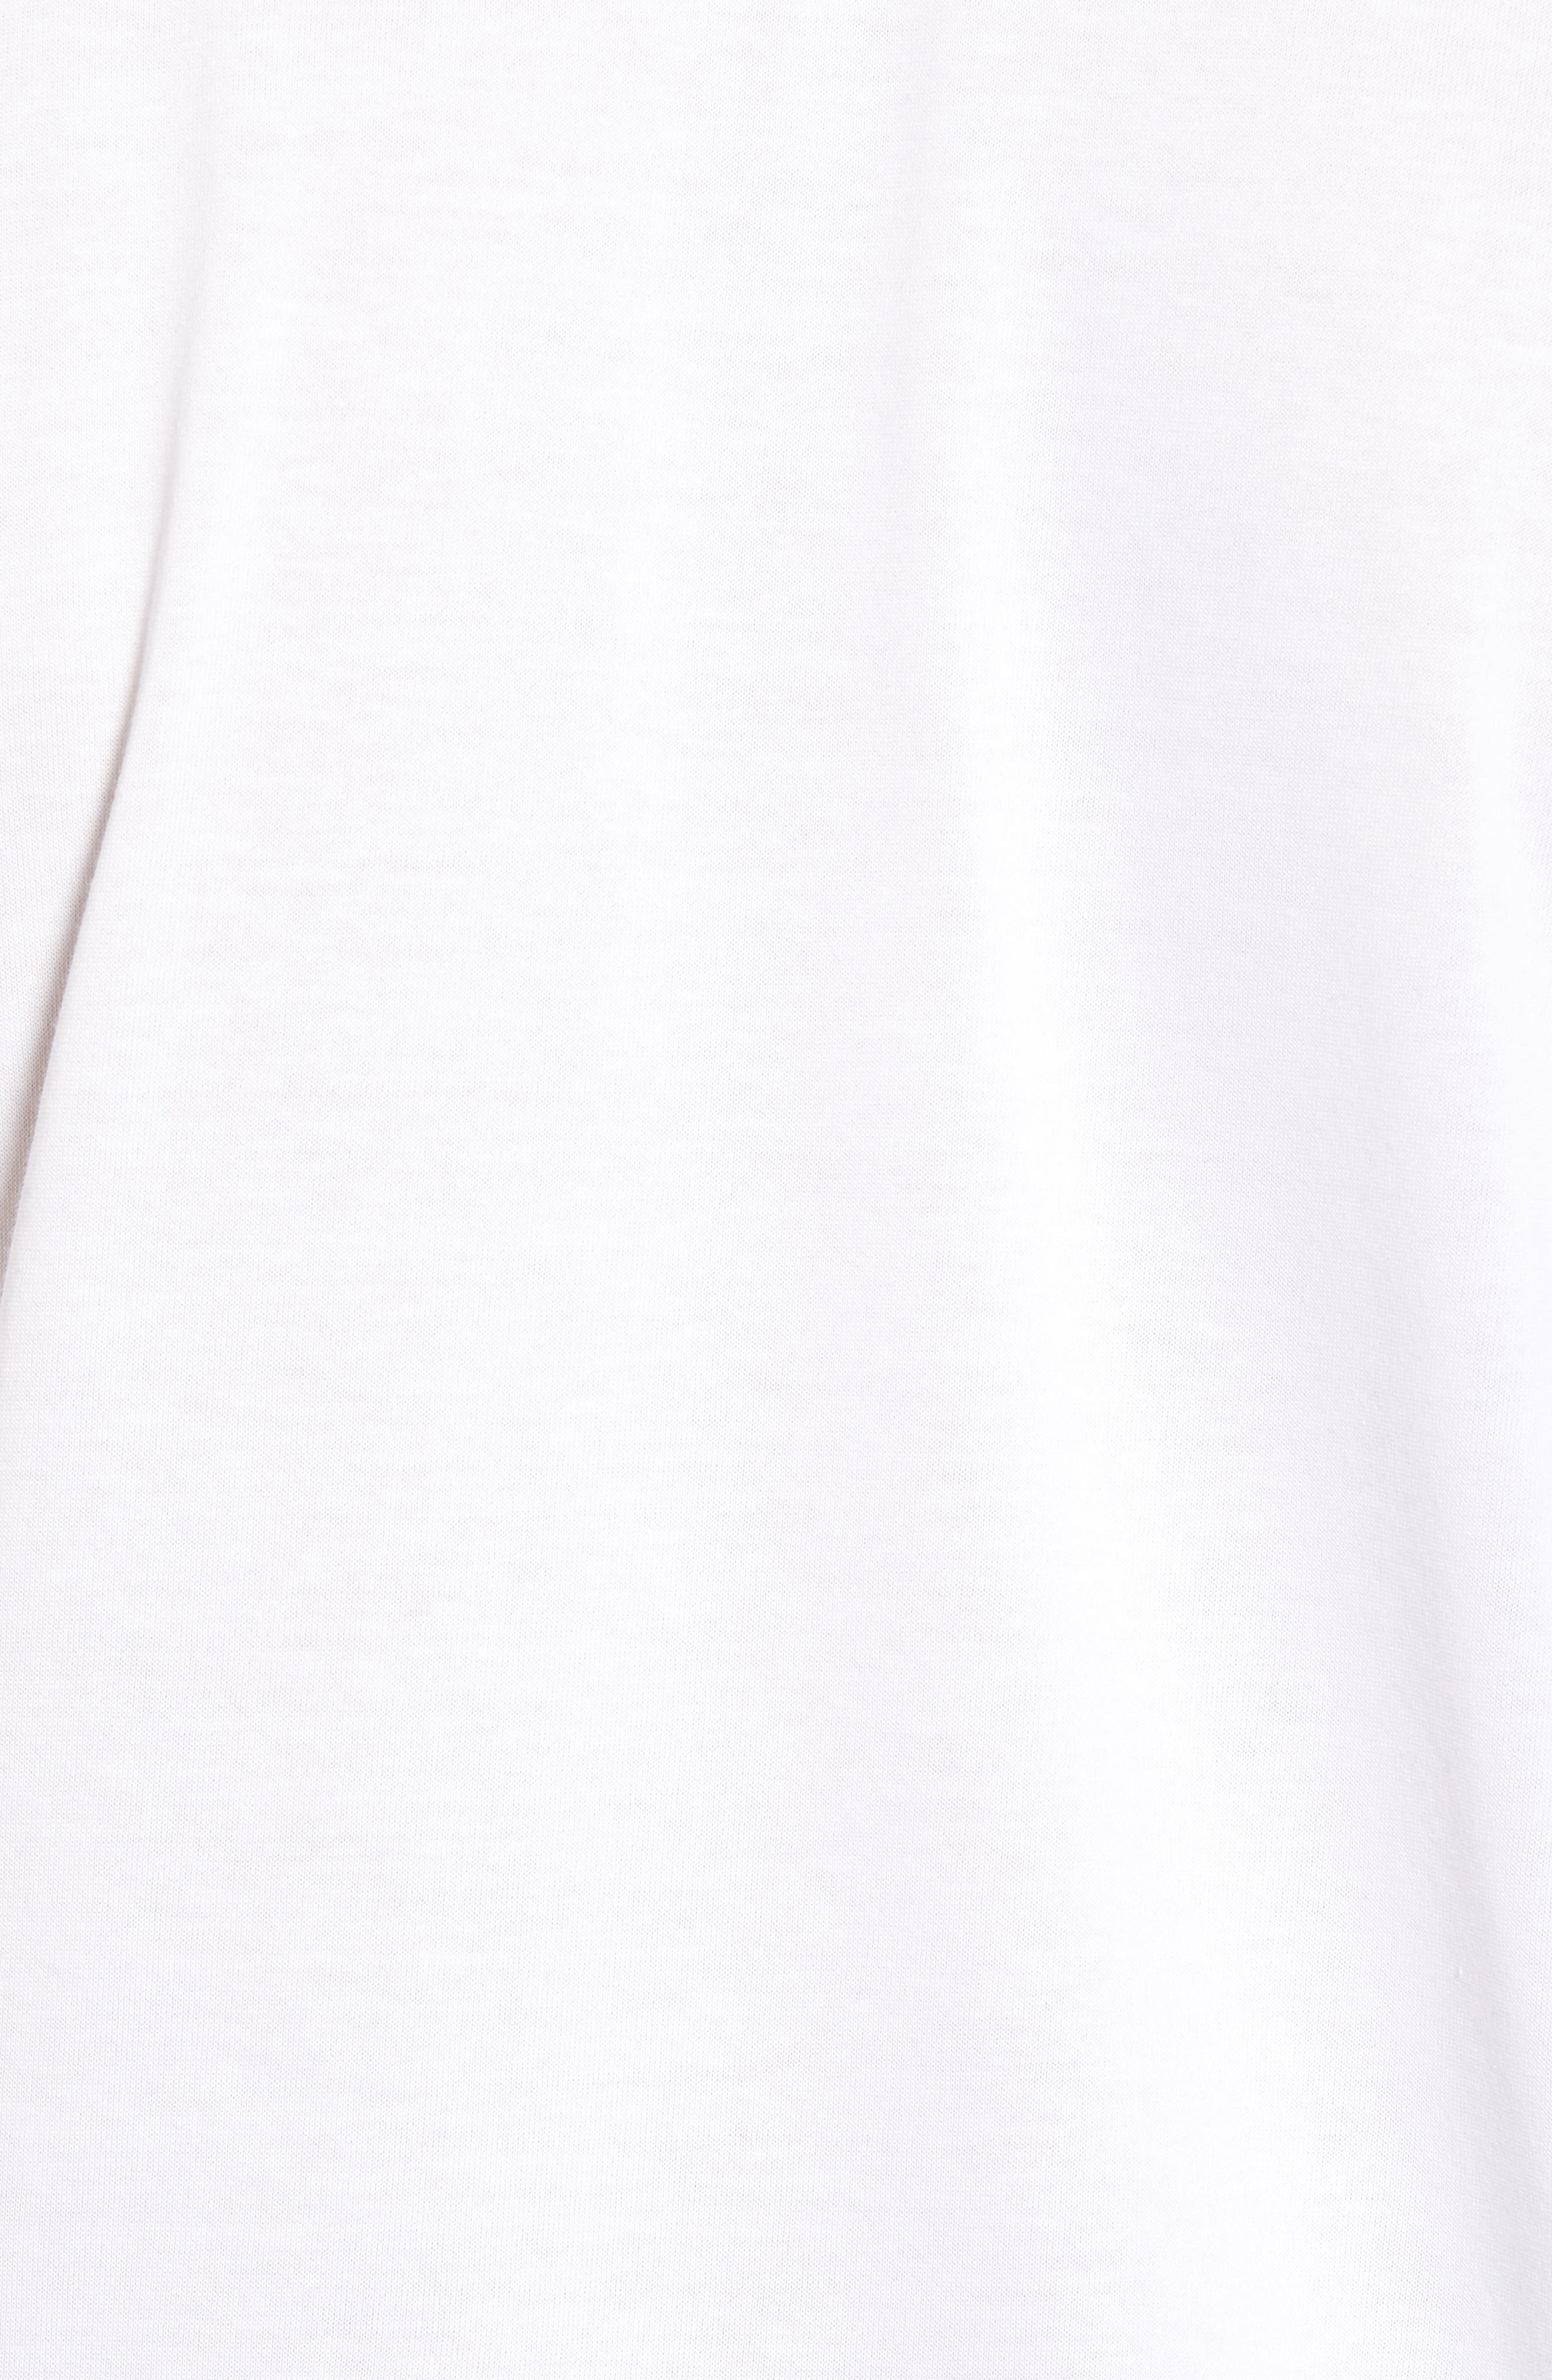 Tech Vertical Stripe Graphic T-Shirt,                             Alternate thumbnail 6, color,                             U88 White/ Ocean-Ladybird-Blac